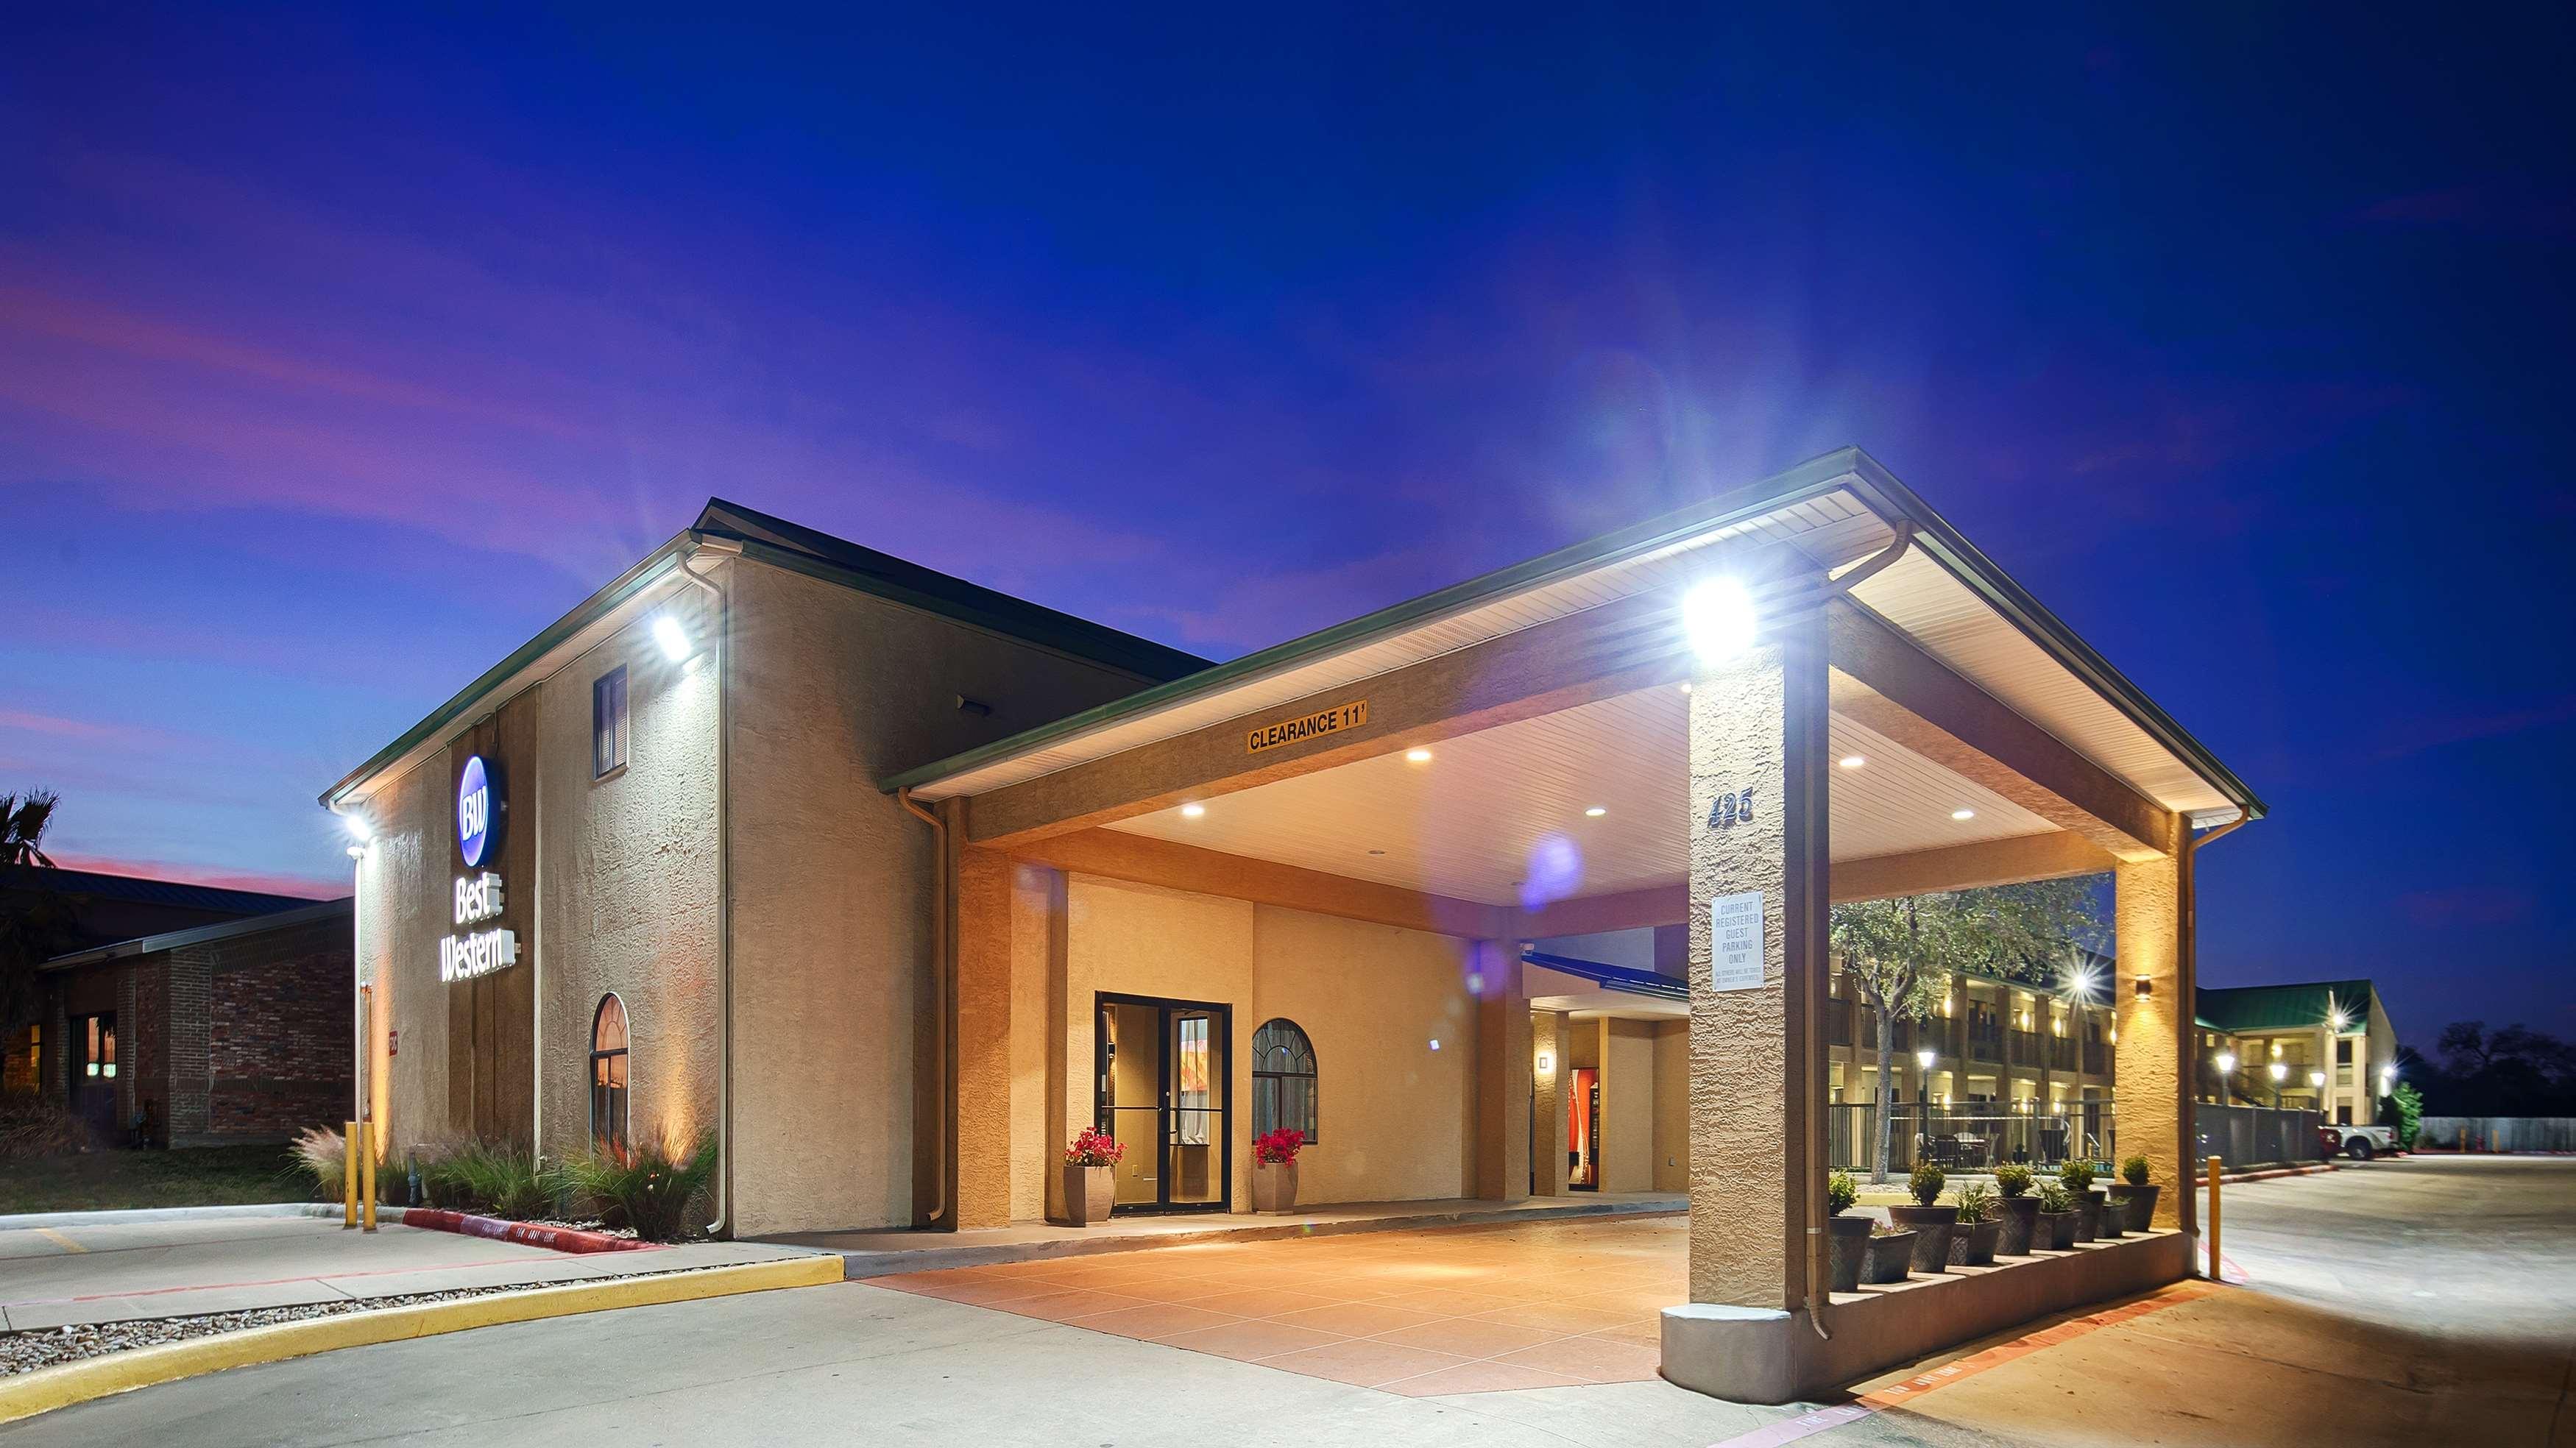 Best Western Cedar Inn image 0